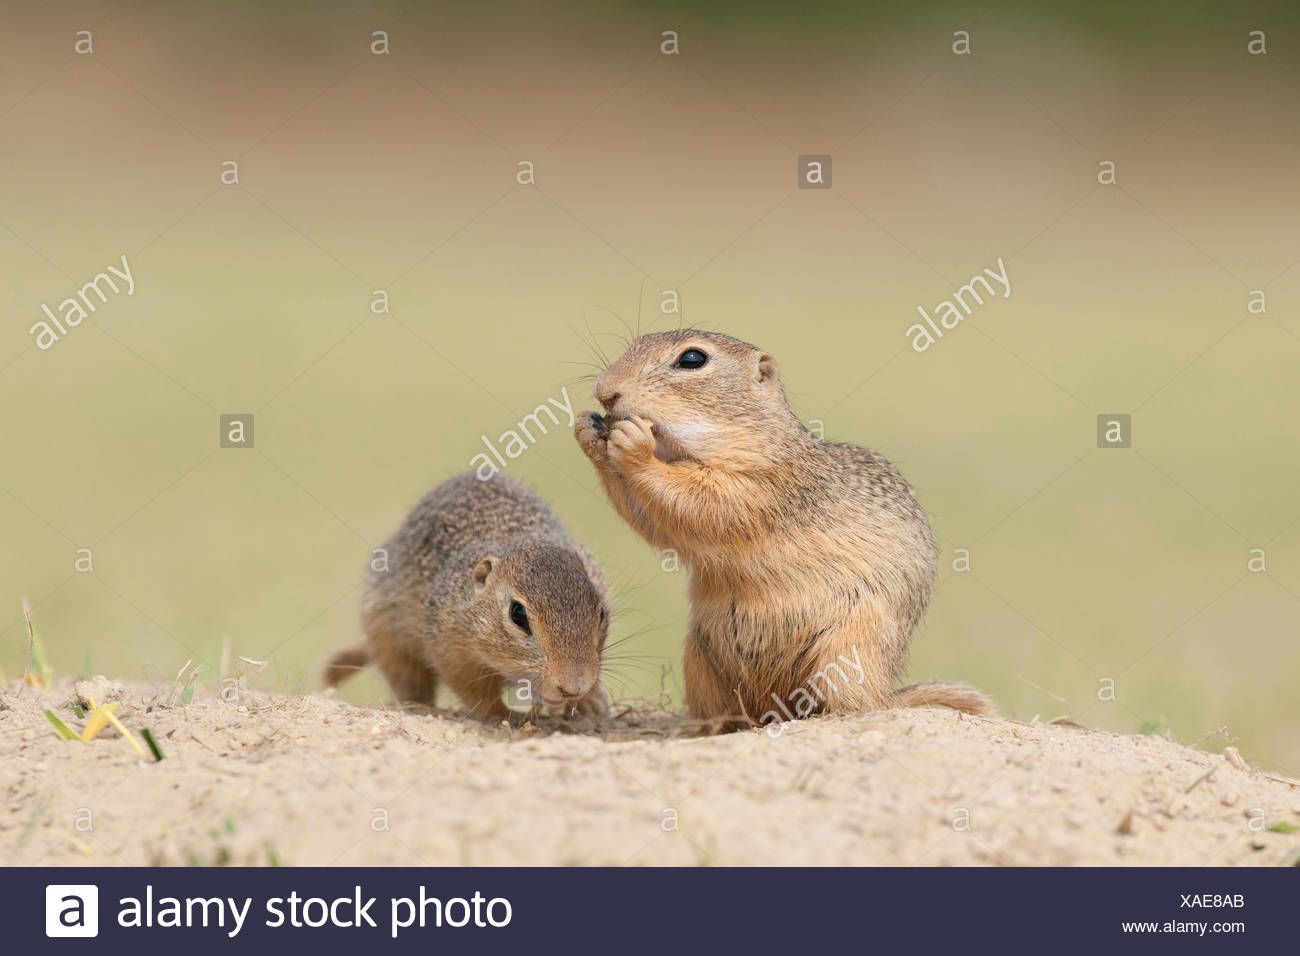 Two European Ground Squirrels or European Sousliks (Spermophilus citellus), Seewinkel, Burgenland, Austria Stock Photo